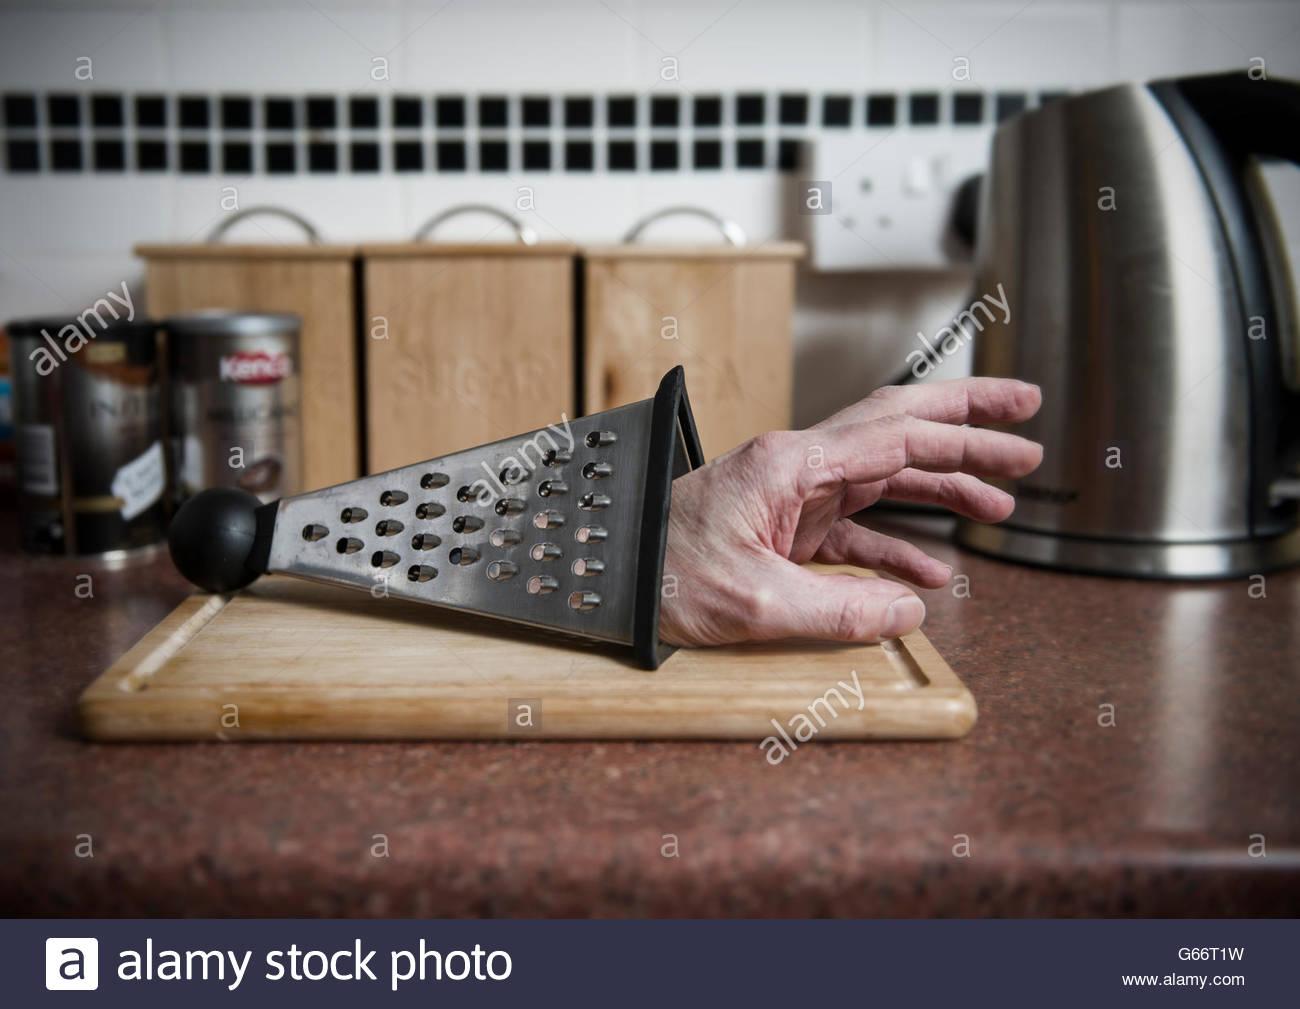 Severed Hand Stockfotos & Severed Hand Bilder - Alamy